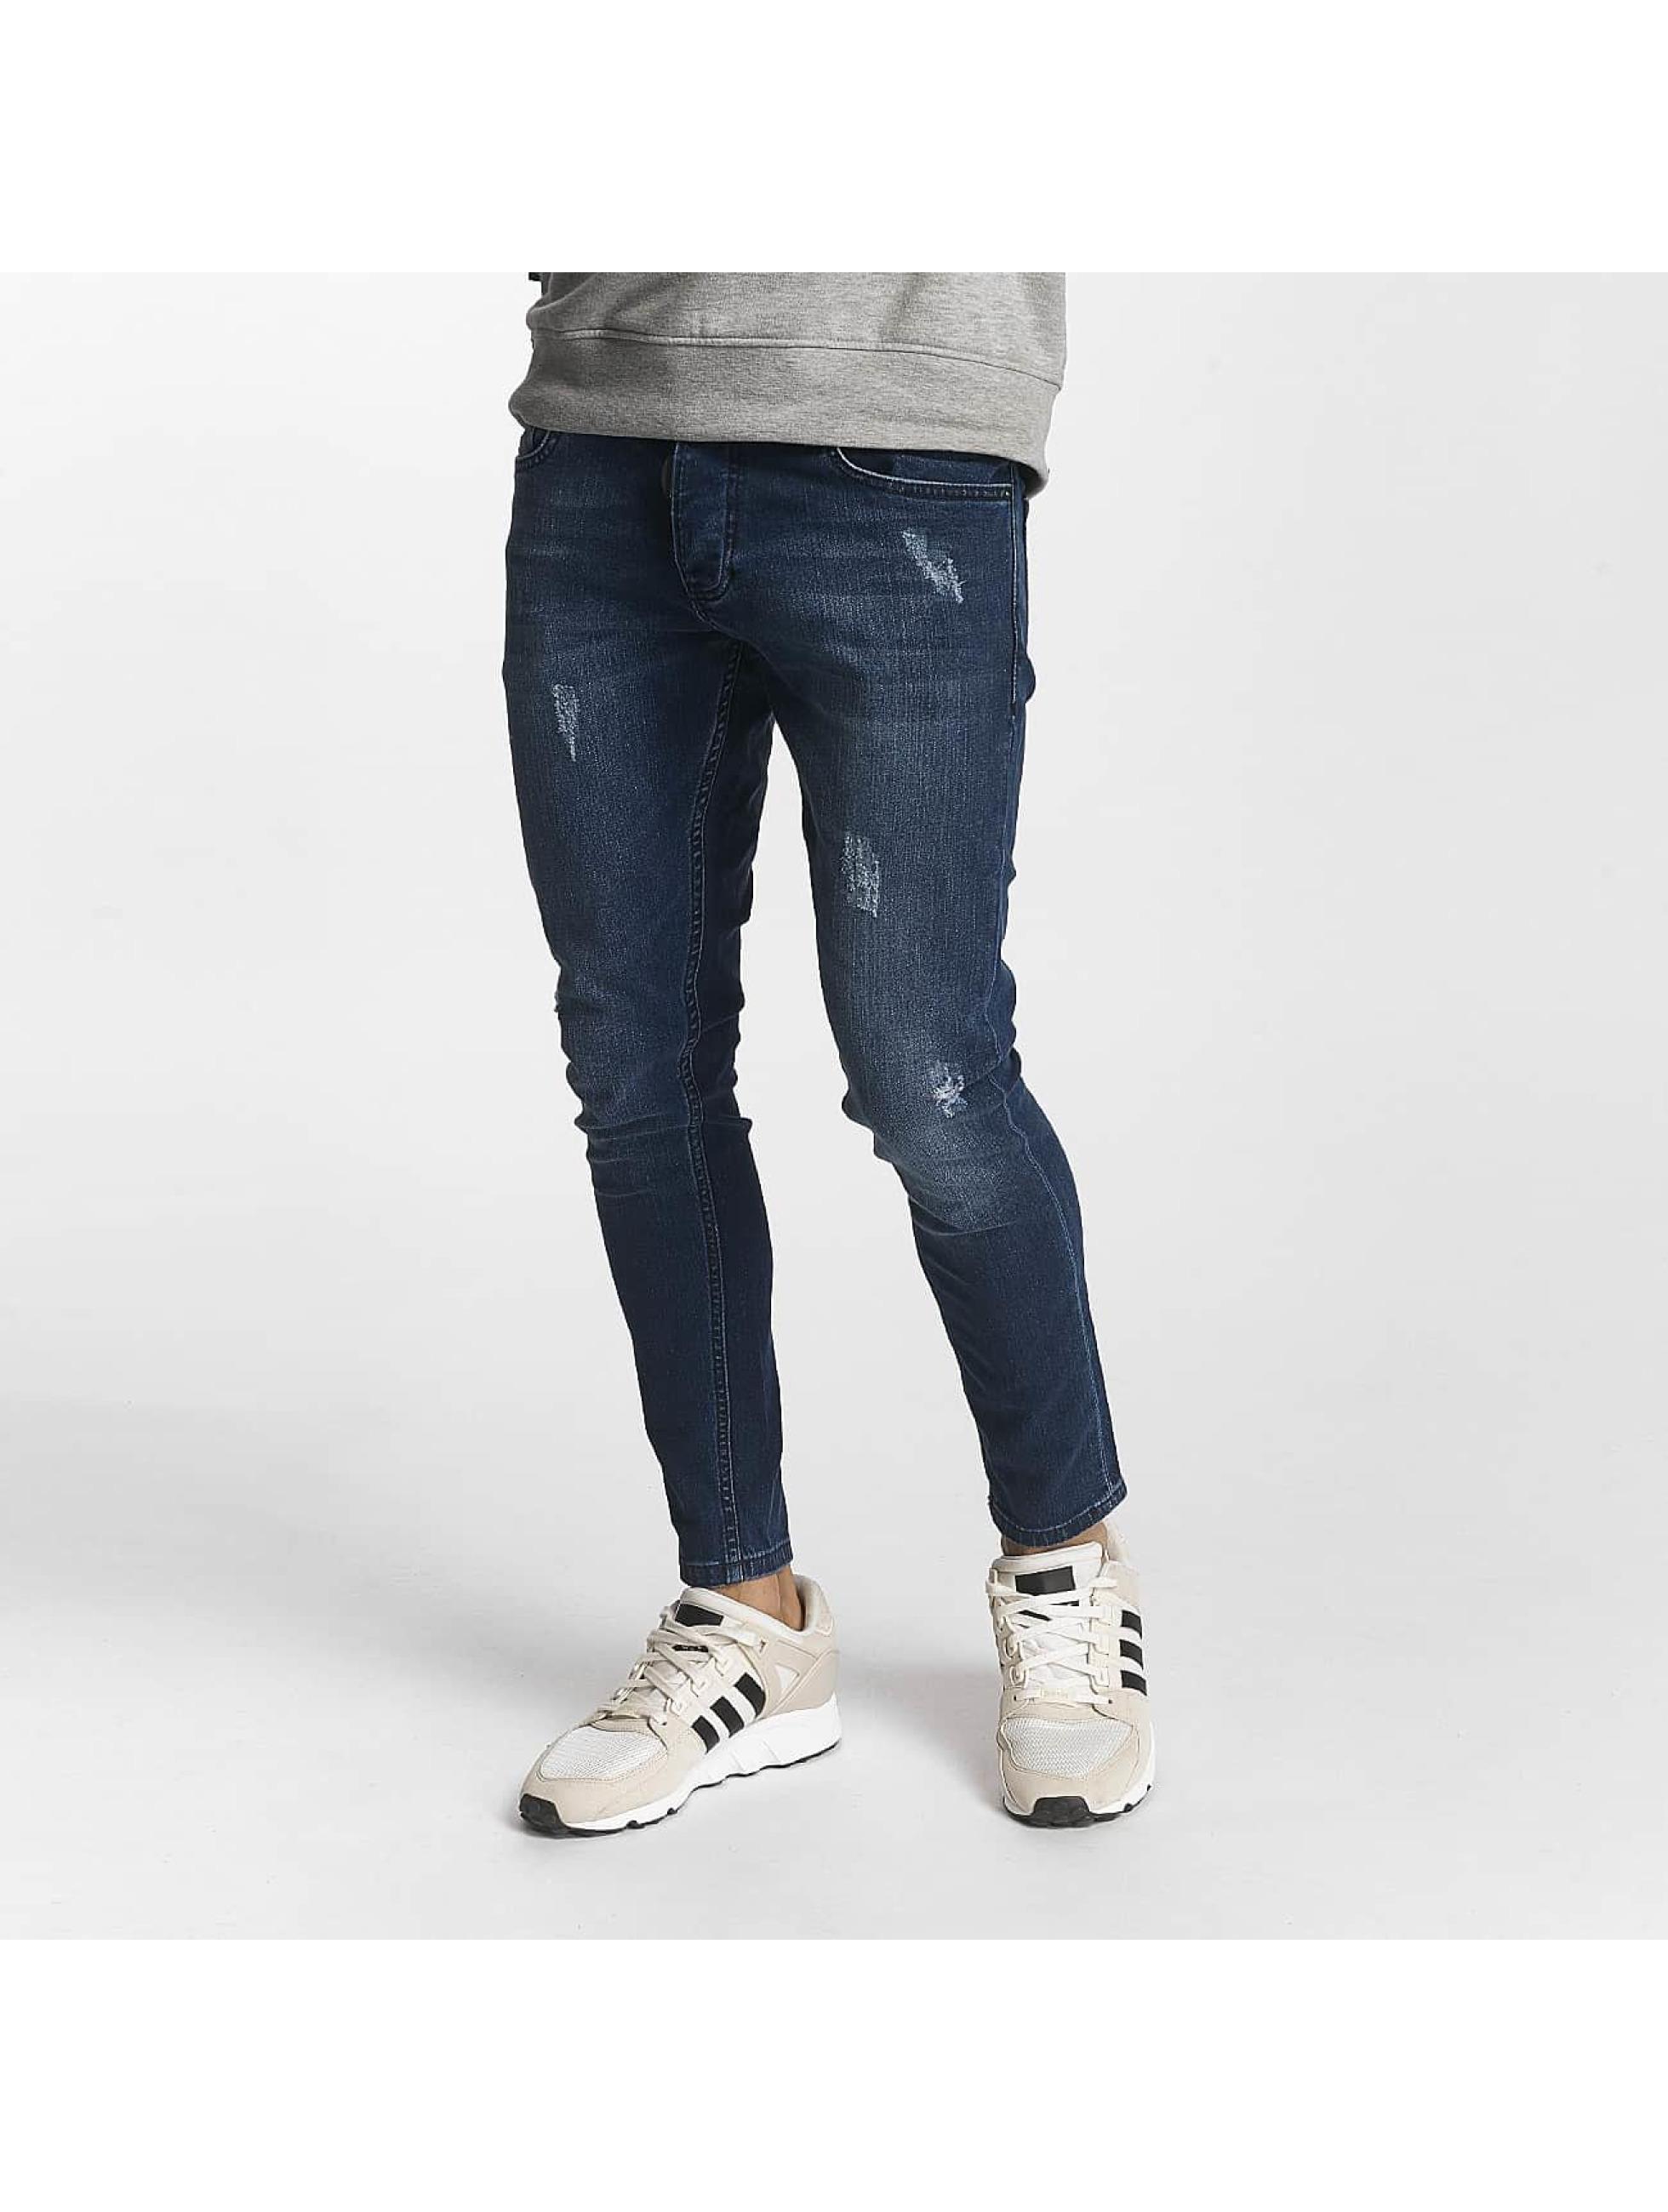 2Y / Slim Fit Jeans Henry in blue W 33